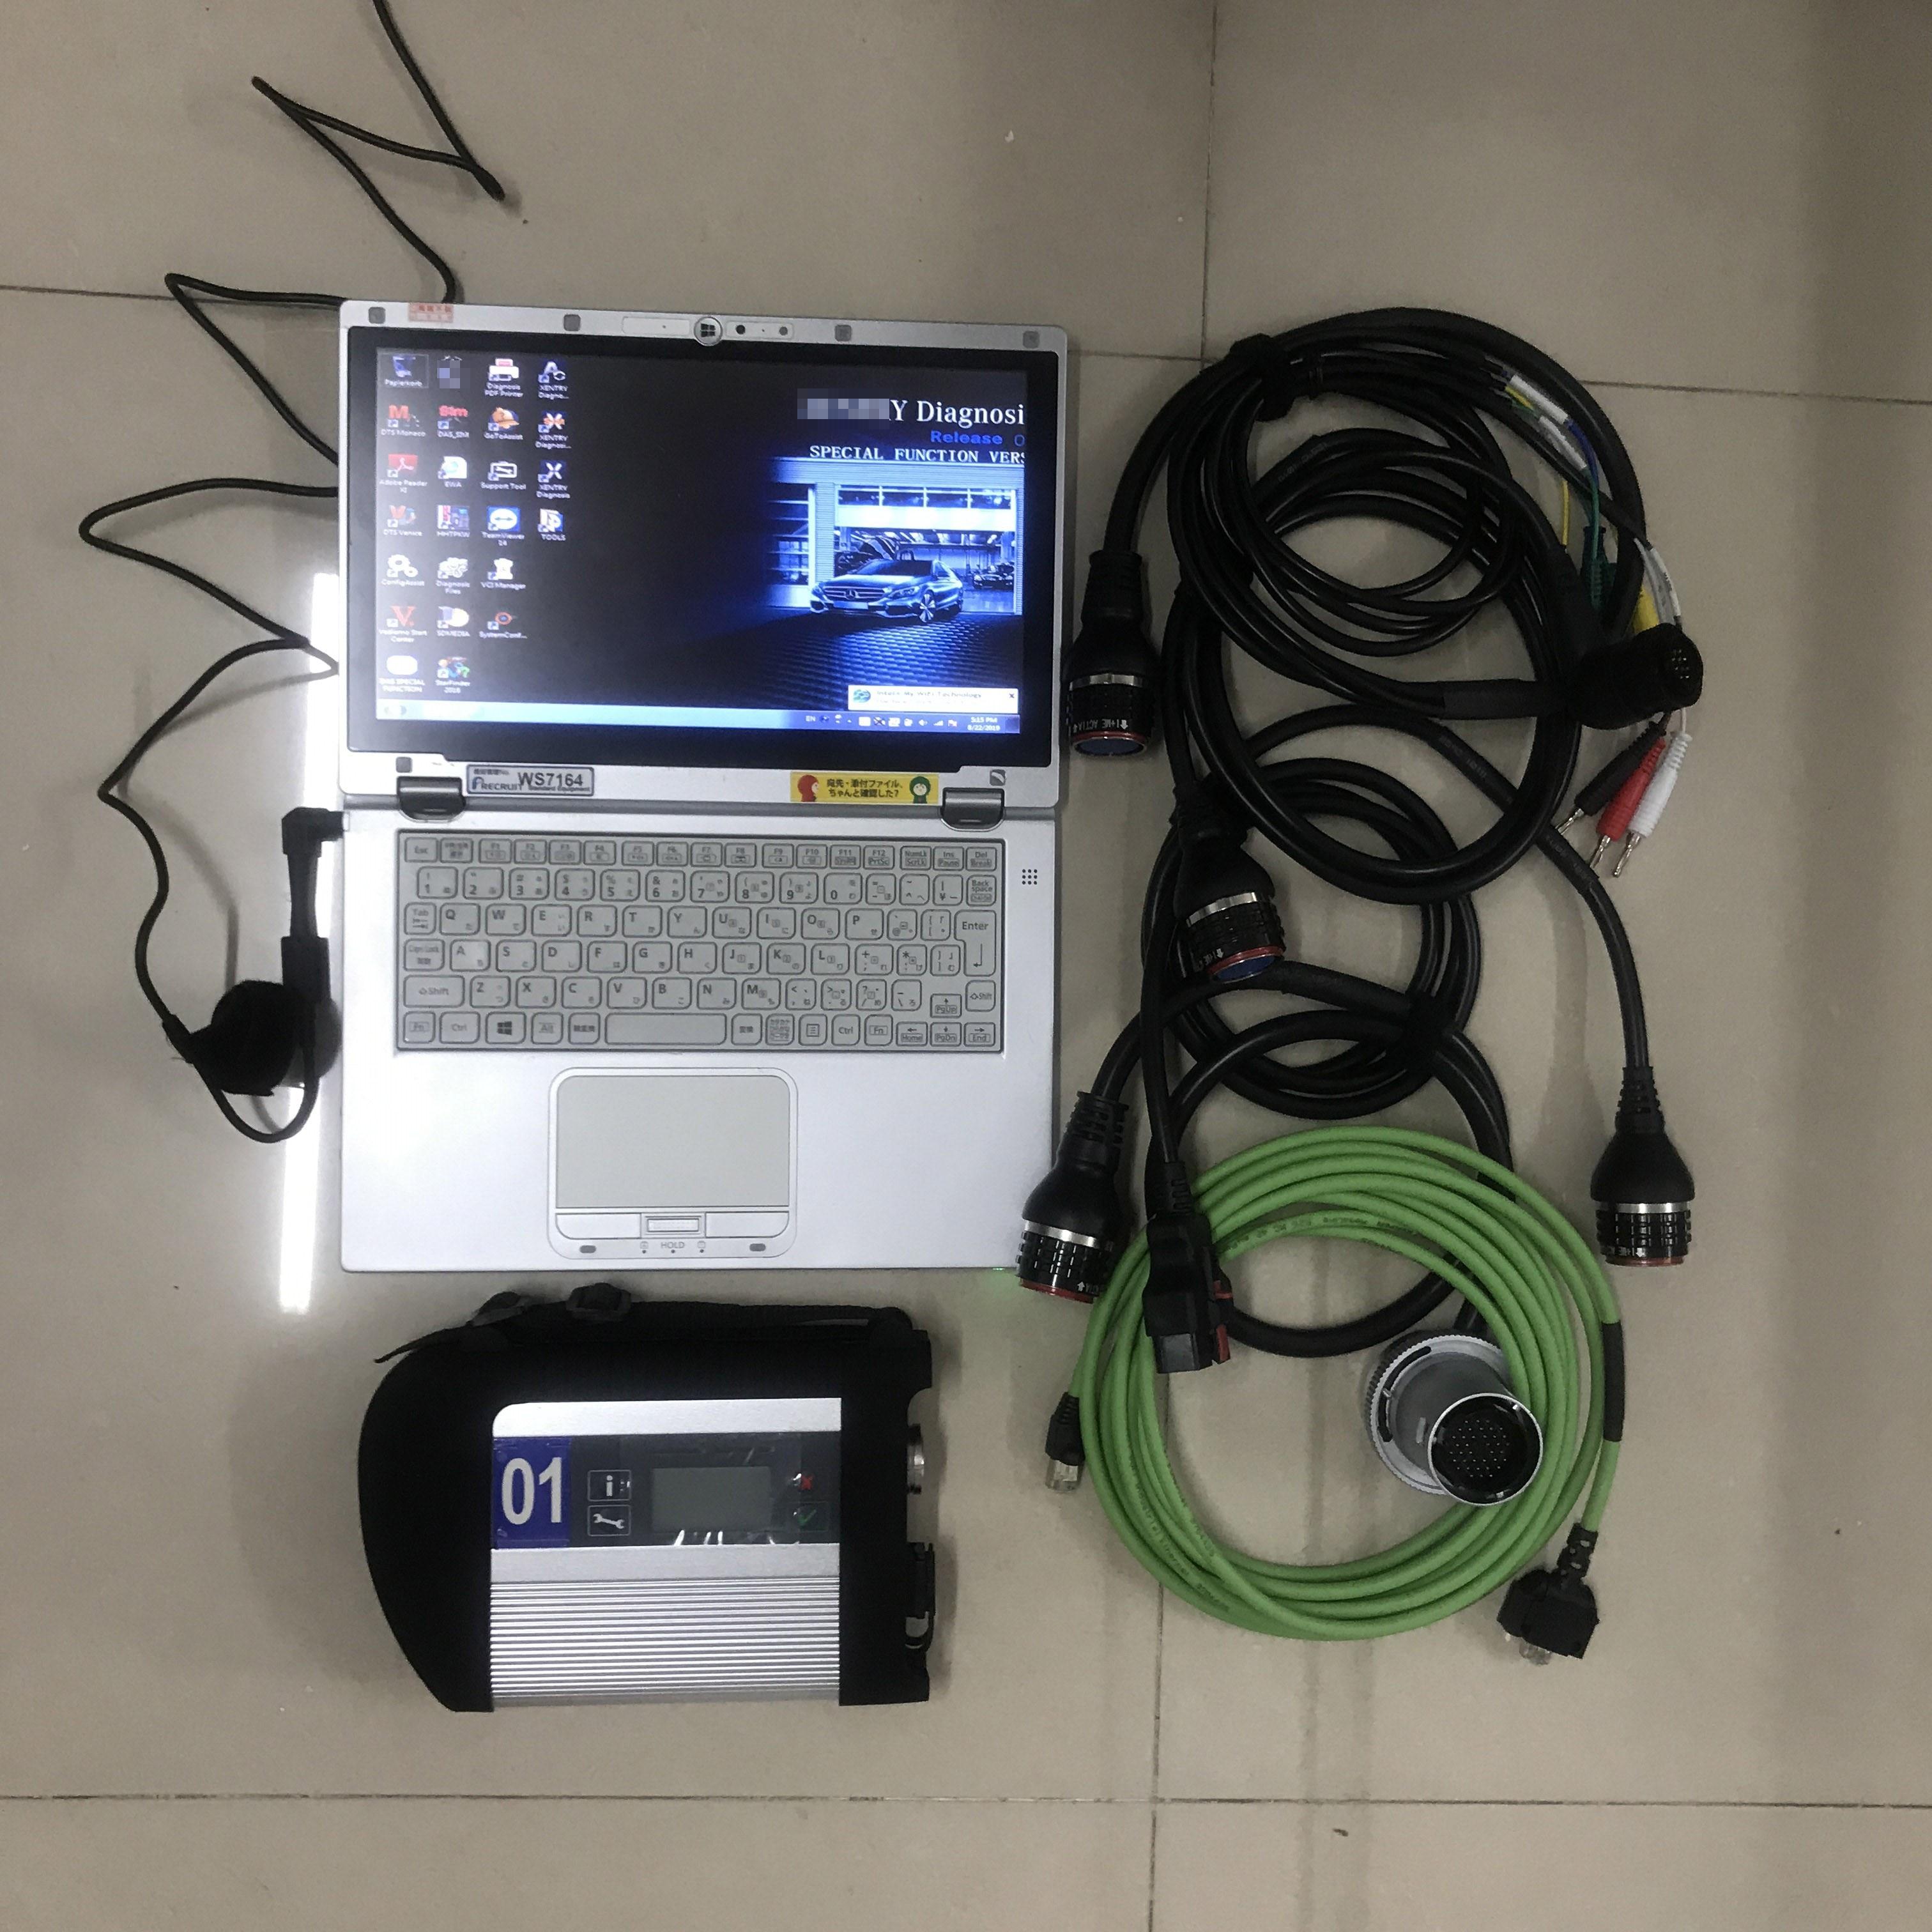 MB Star C4 Sd мультиплексор c4 с ноутбуком CF-AX2 i5 480 ГБ SSD 2020,06 X/Vediamo/DAS/DTS/EPC/HHT для MB star авто диагностический инструмент